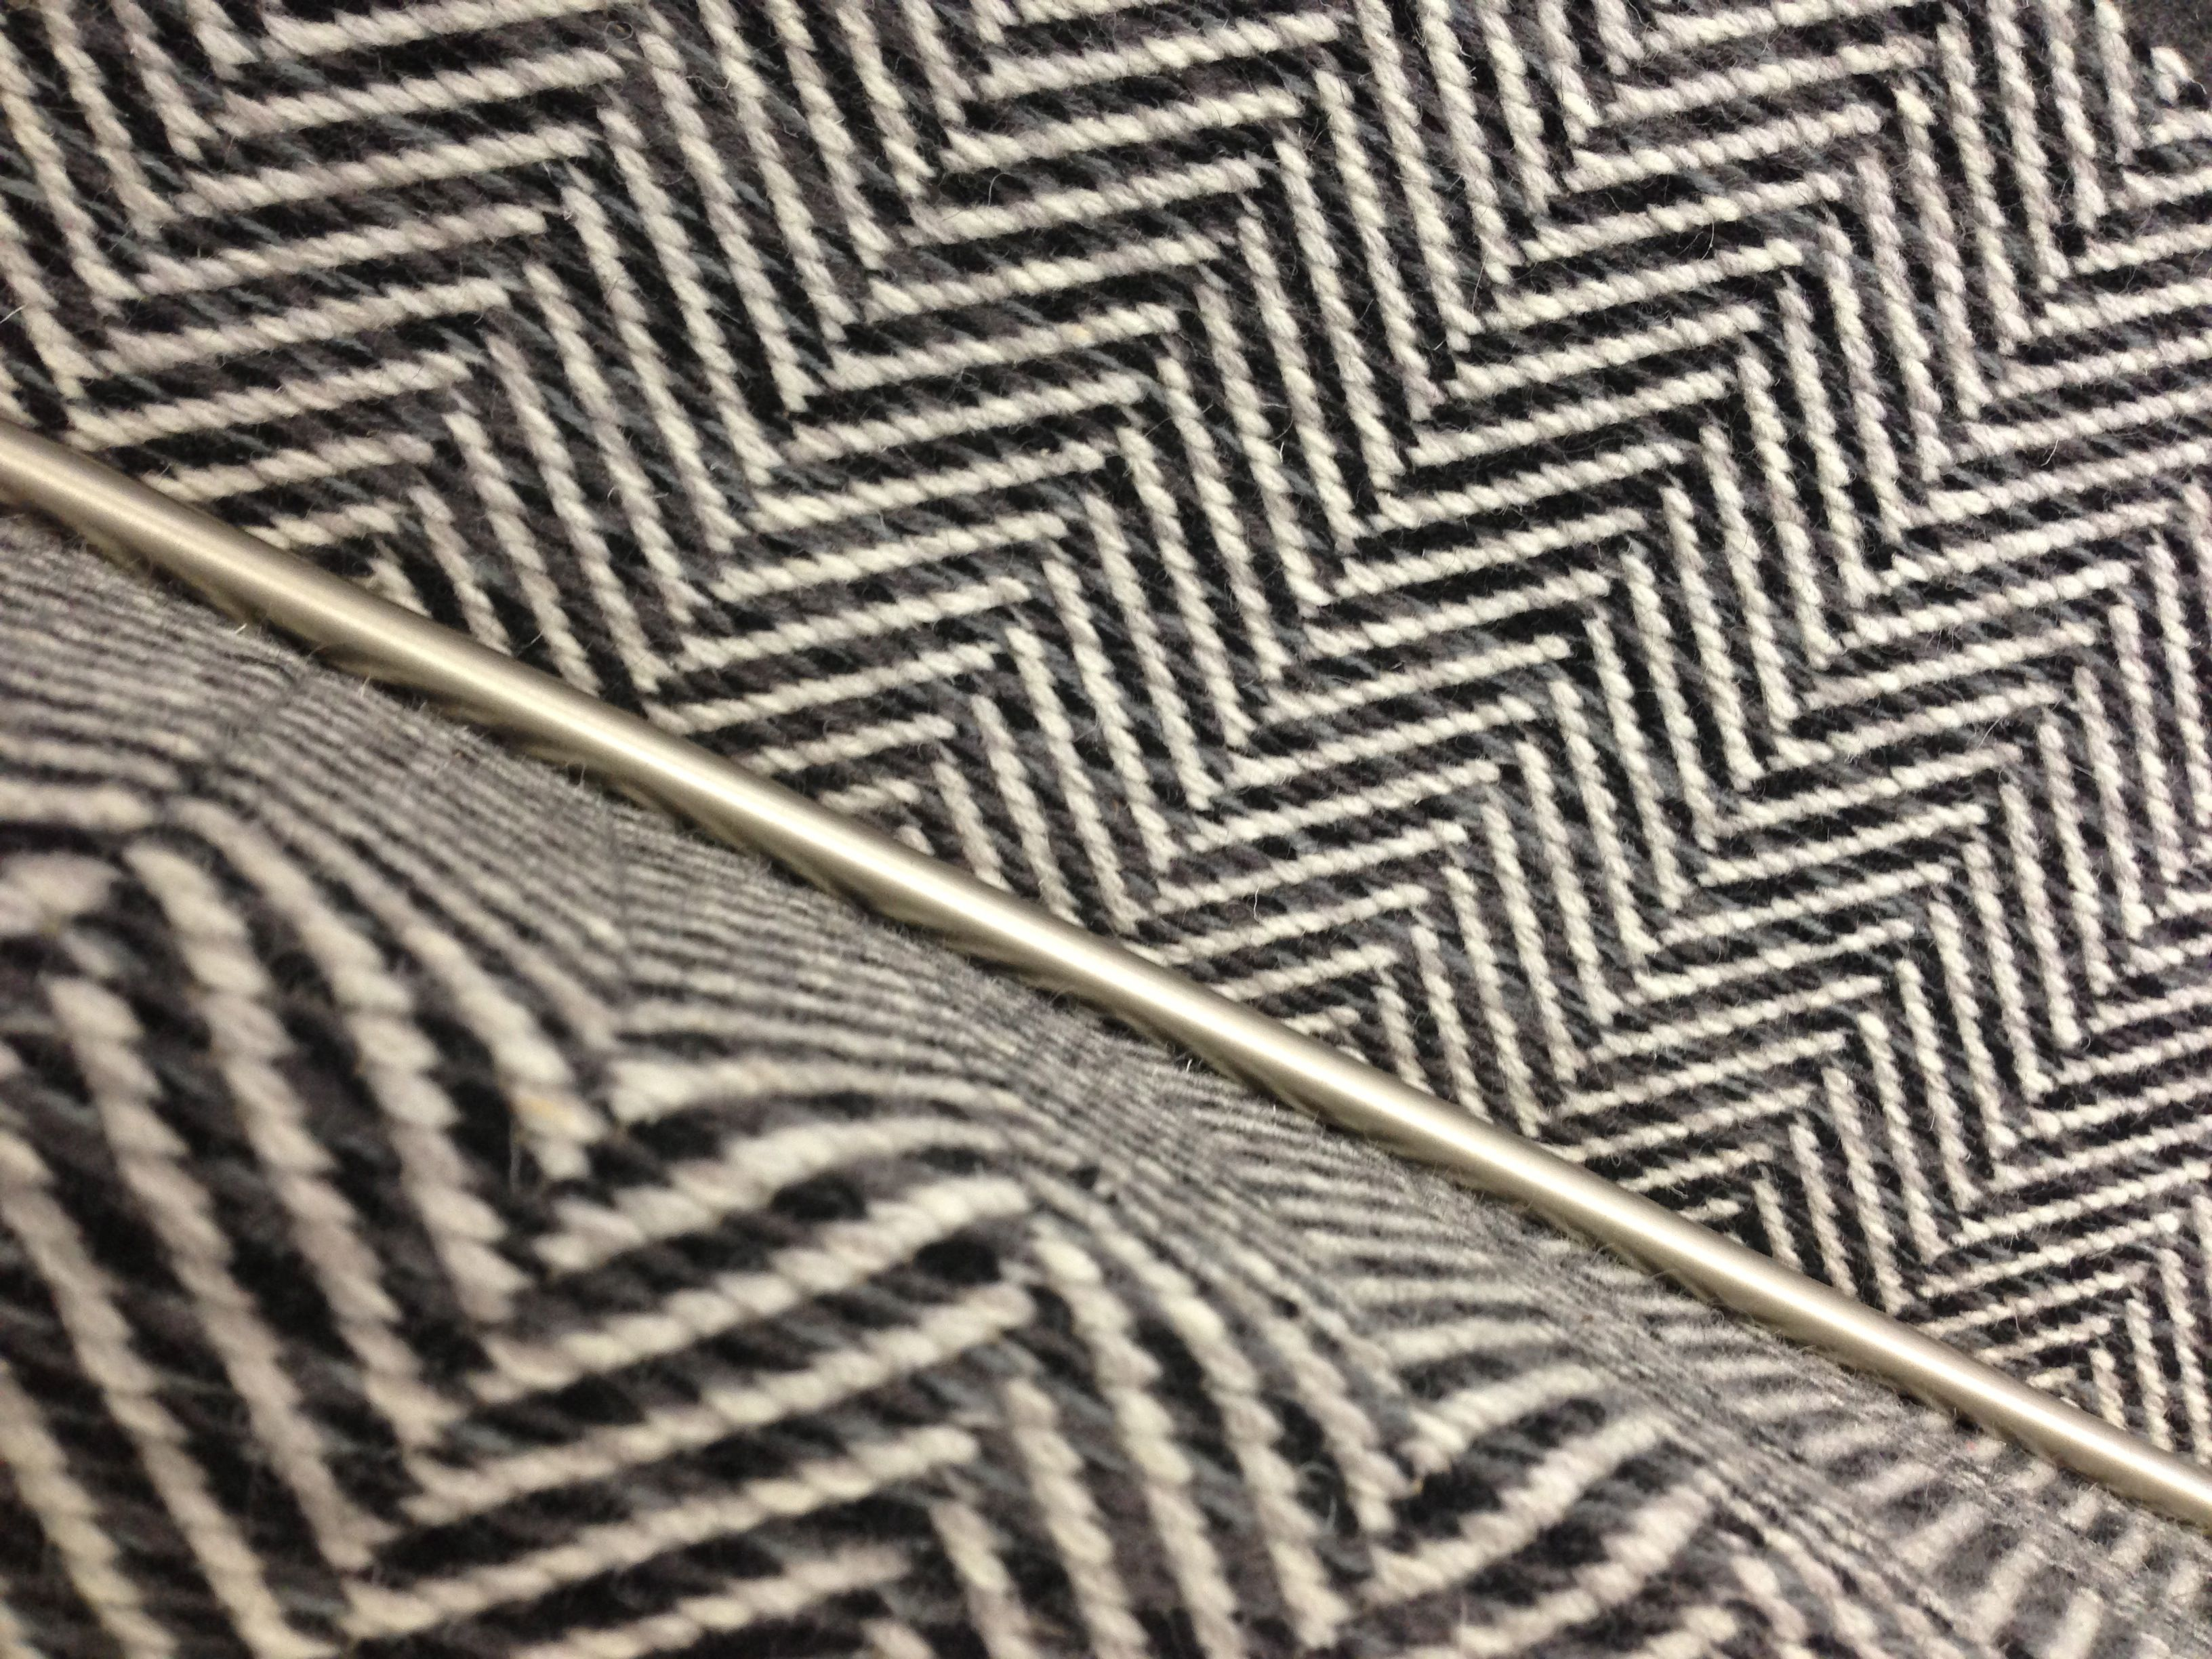 Best Cavalcanti Herringbone Flat Woven Bespoke Rugs And Stair Runners 100 New Zealand Wool 400 x 300